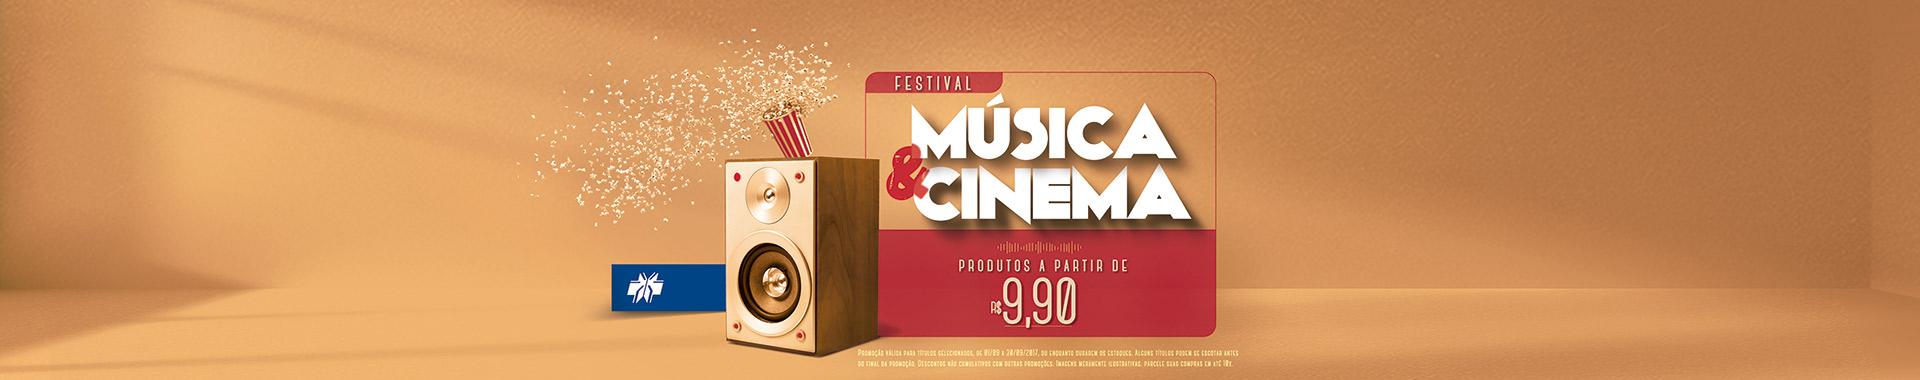 Festival Música & Cinema